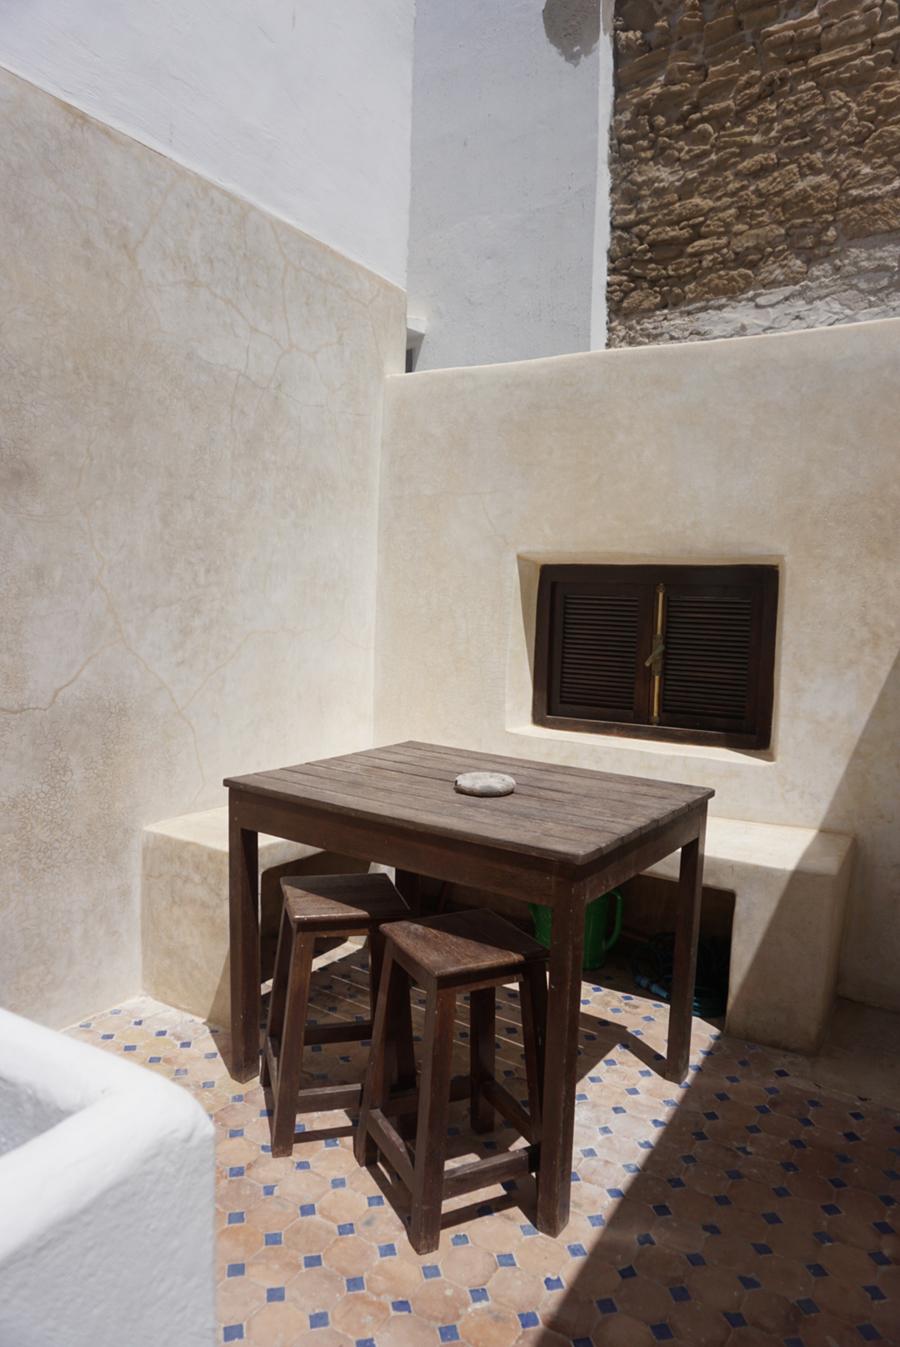 dar-emma-roof-terrace-1.jpg